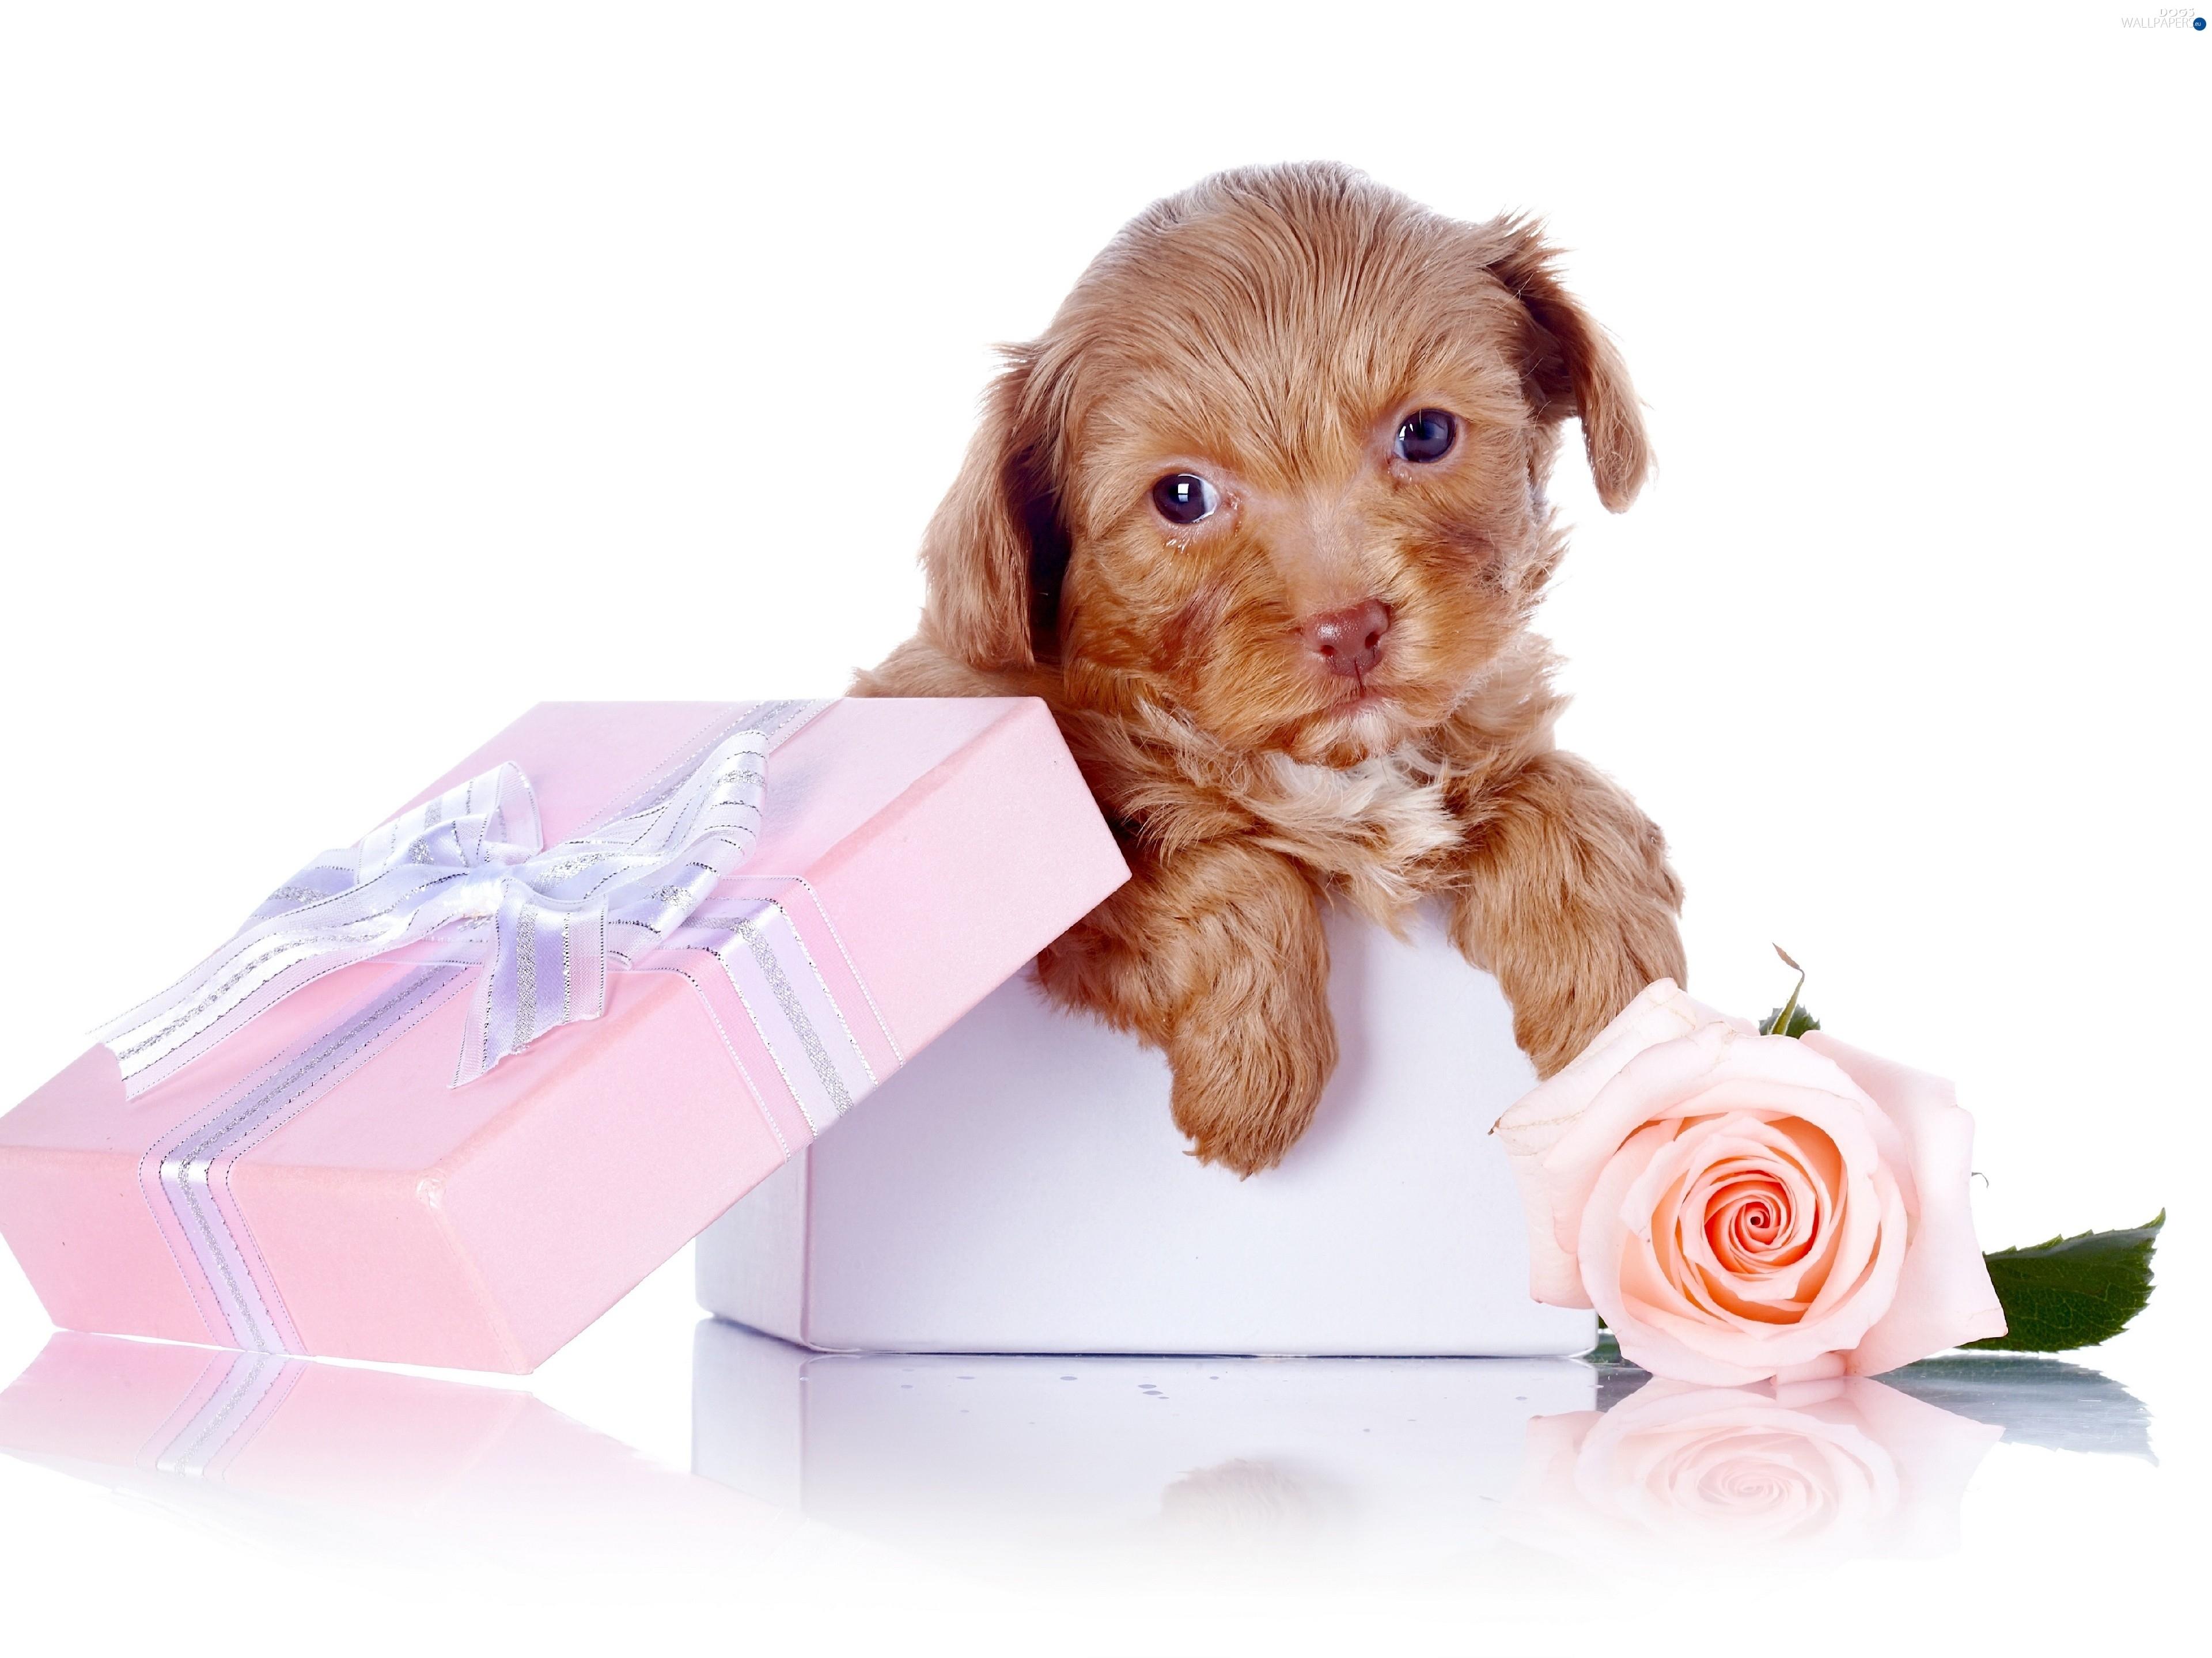 Sweet Present Dog Bichon Frise Puppy Carte Humour Fete Des Meres 3840x2879 Download Hd Wallpaper Wallpapertip